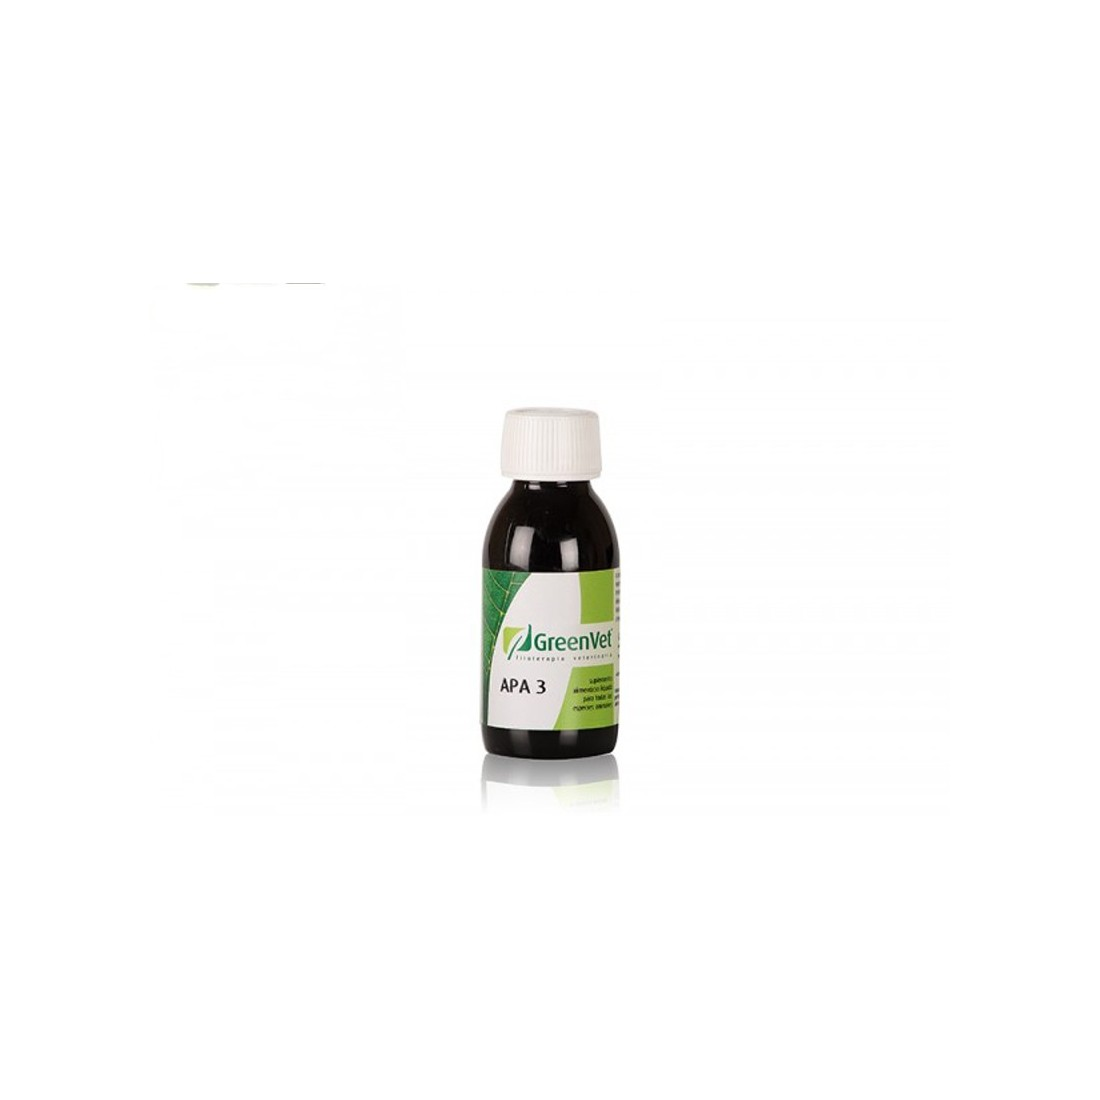 APA 3 (COCCIDIO, ATOXOPLASMA, TRICOMONAS)